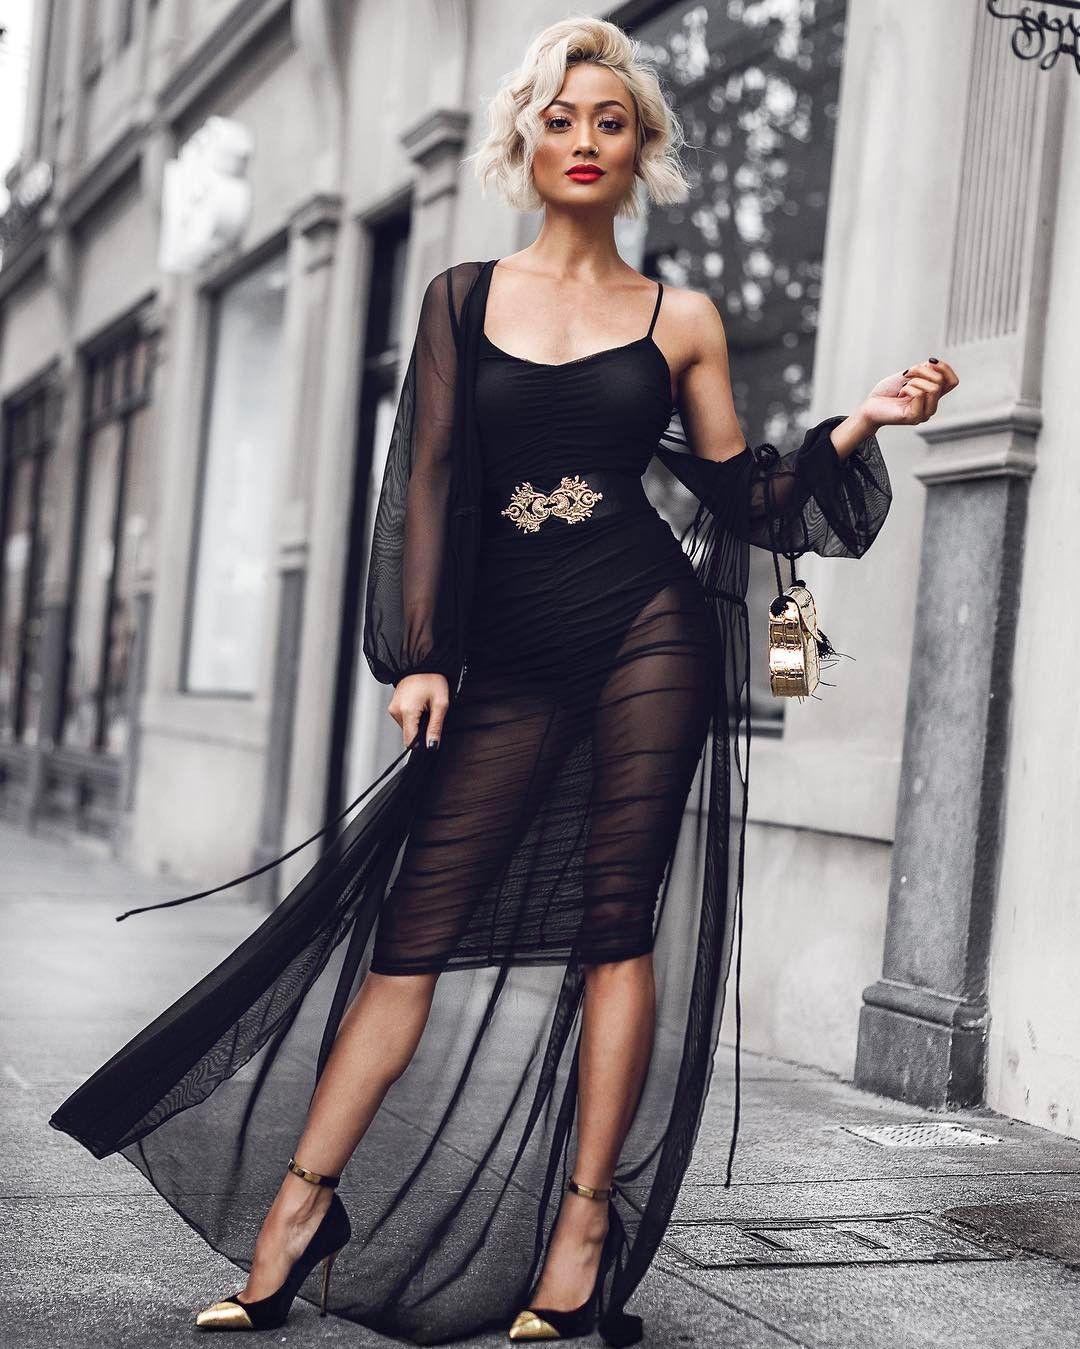 Black dress comments - 3 729 Likes 38 Comments Micah Gianneli Micahgianneli On Instagram